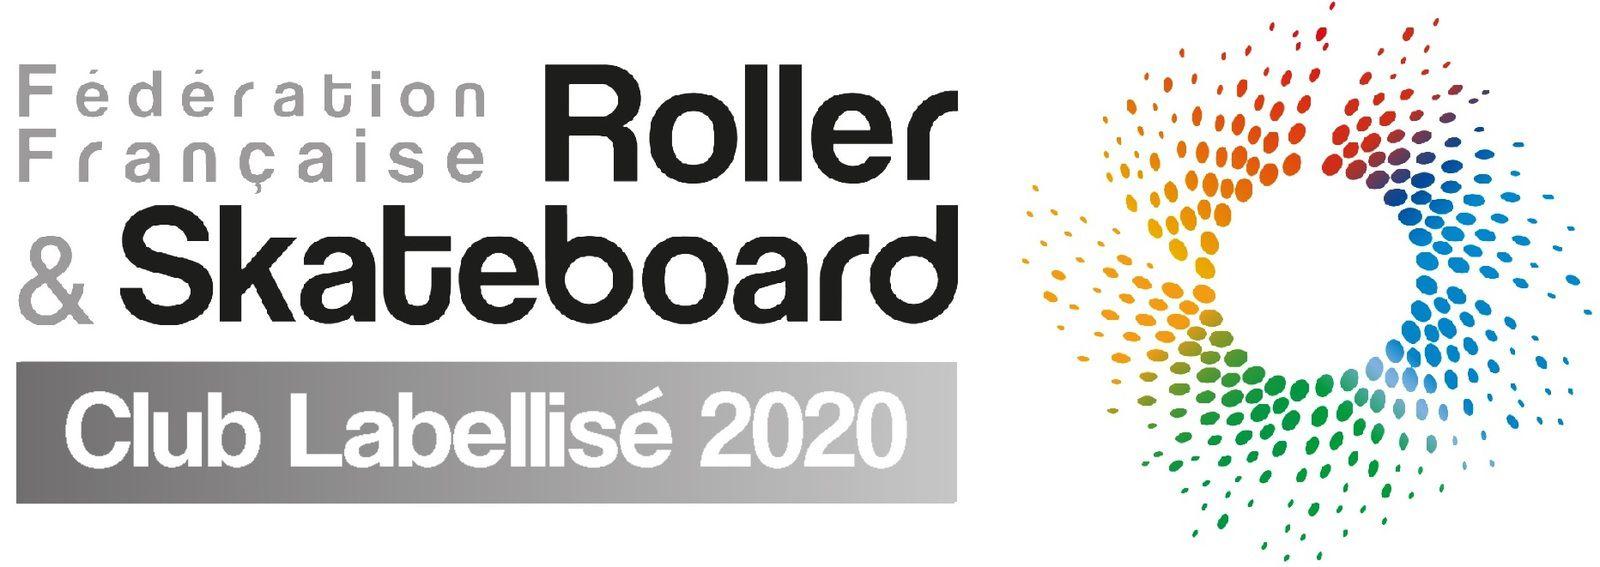 Roller Lib, Nîmes, Club de sports, patinage, club labellisé